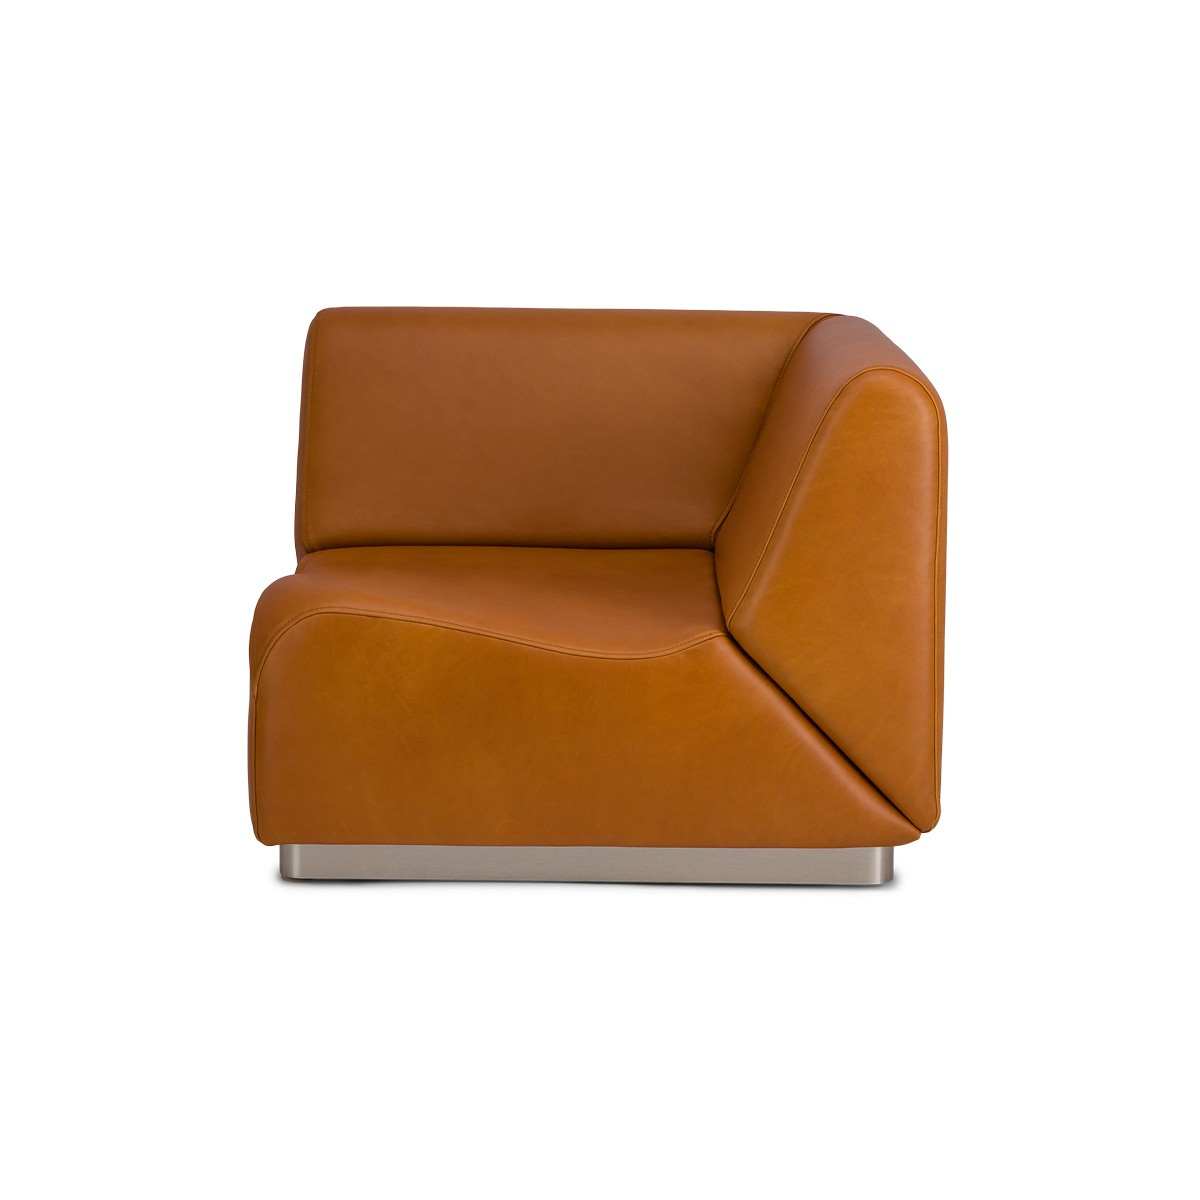 Rotondo Corner Module in Camel Leather